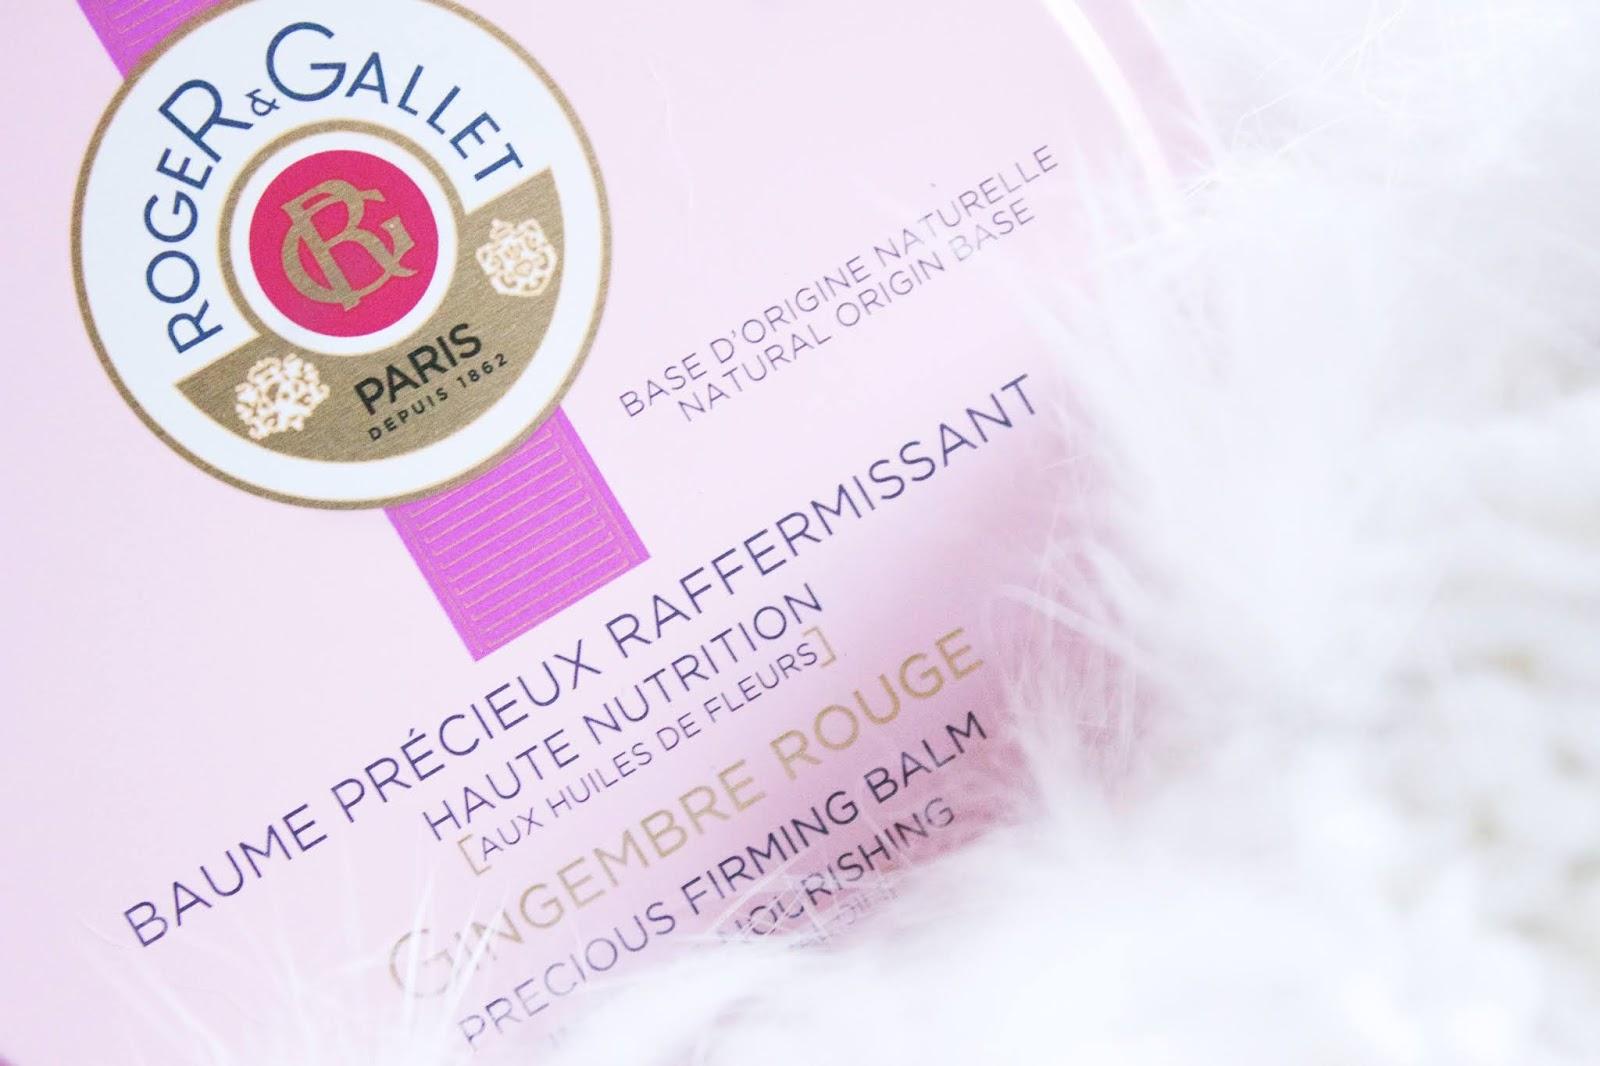 baume-precieux-raffermissant-roger-gallet